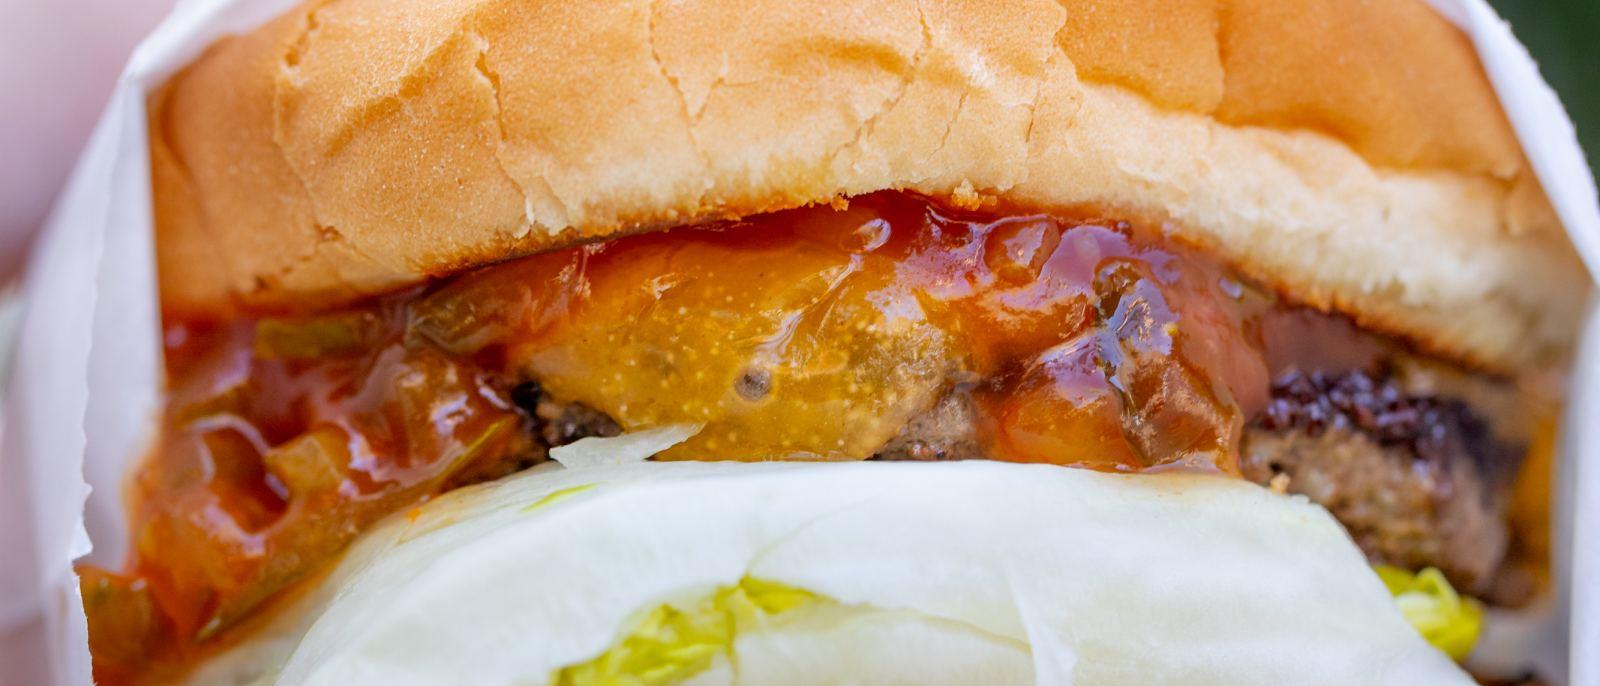 Steakburger at The Apple Pan